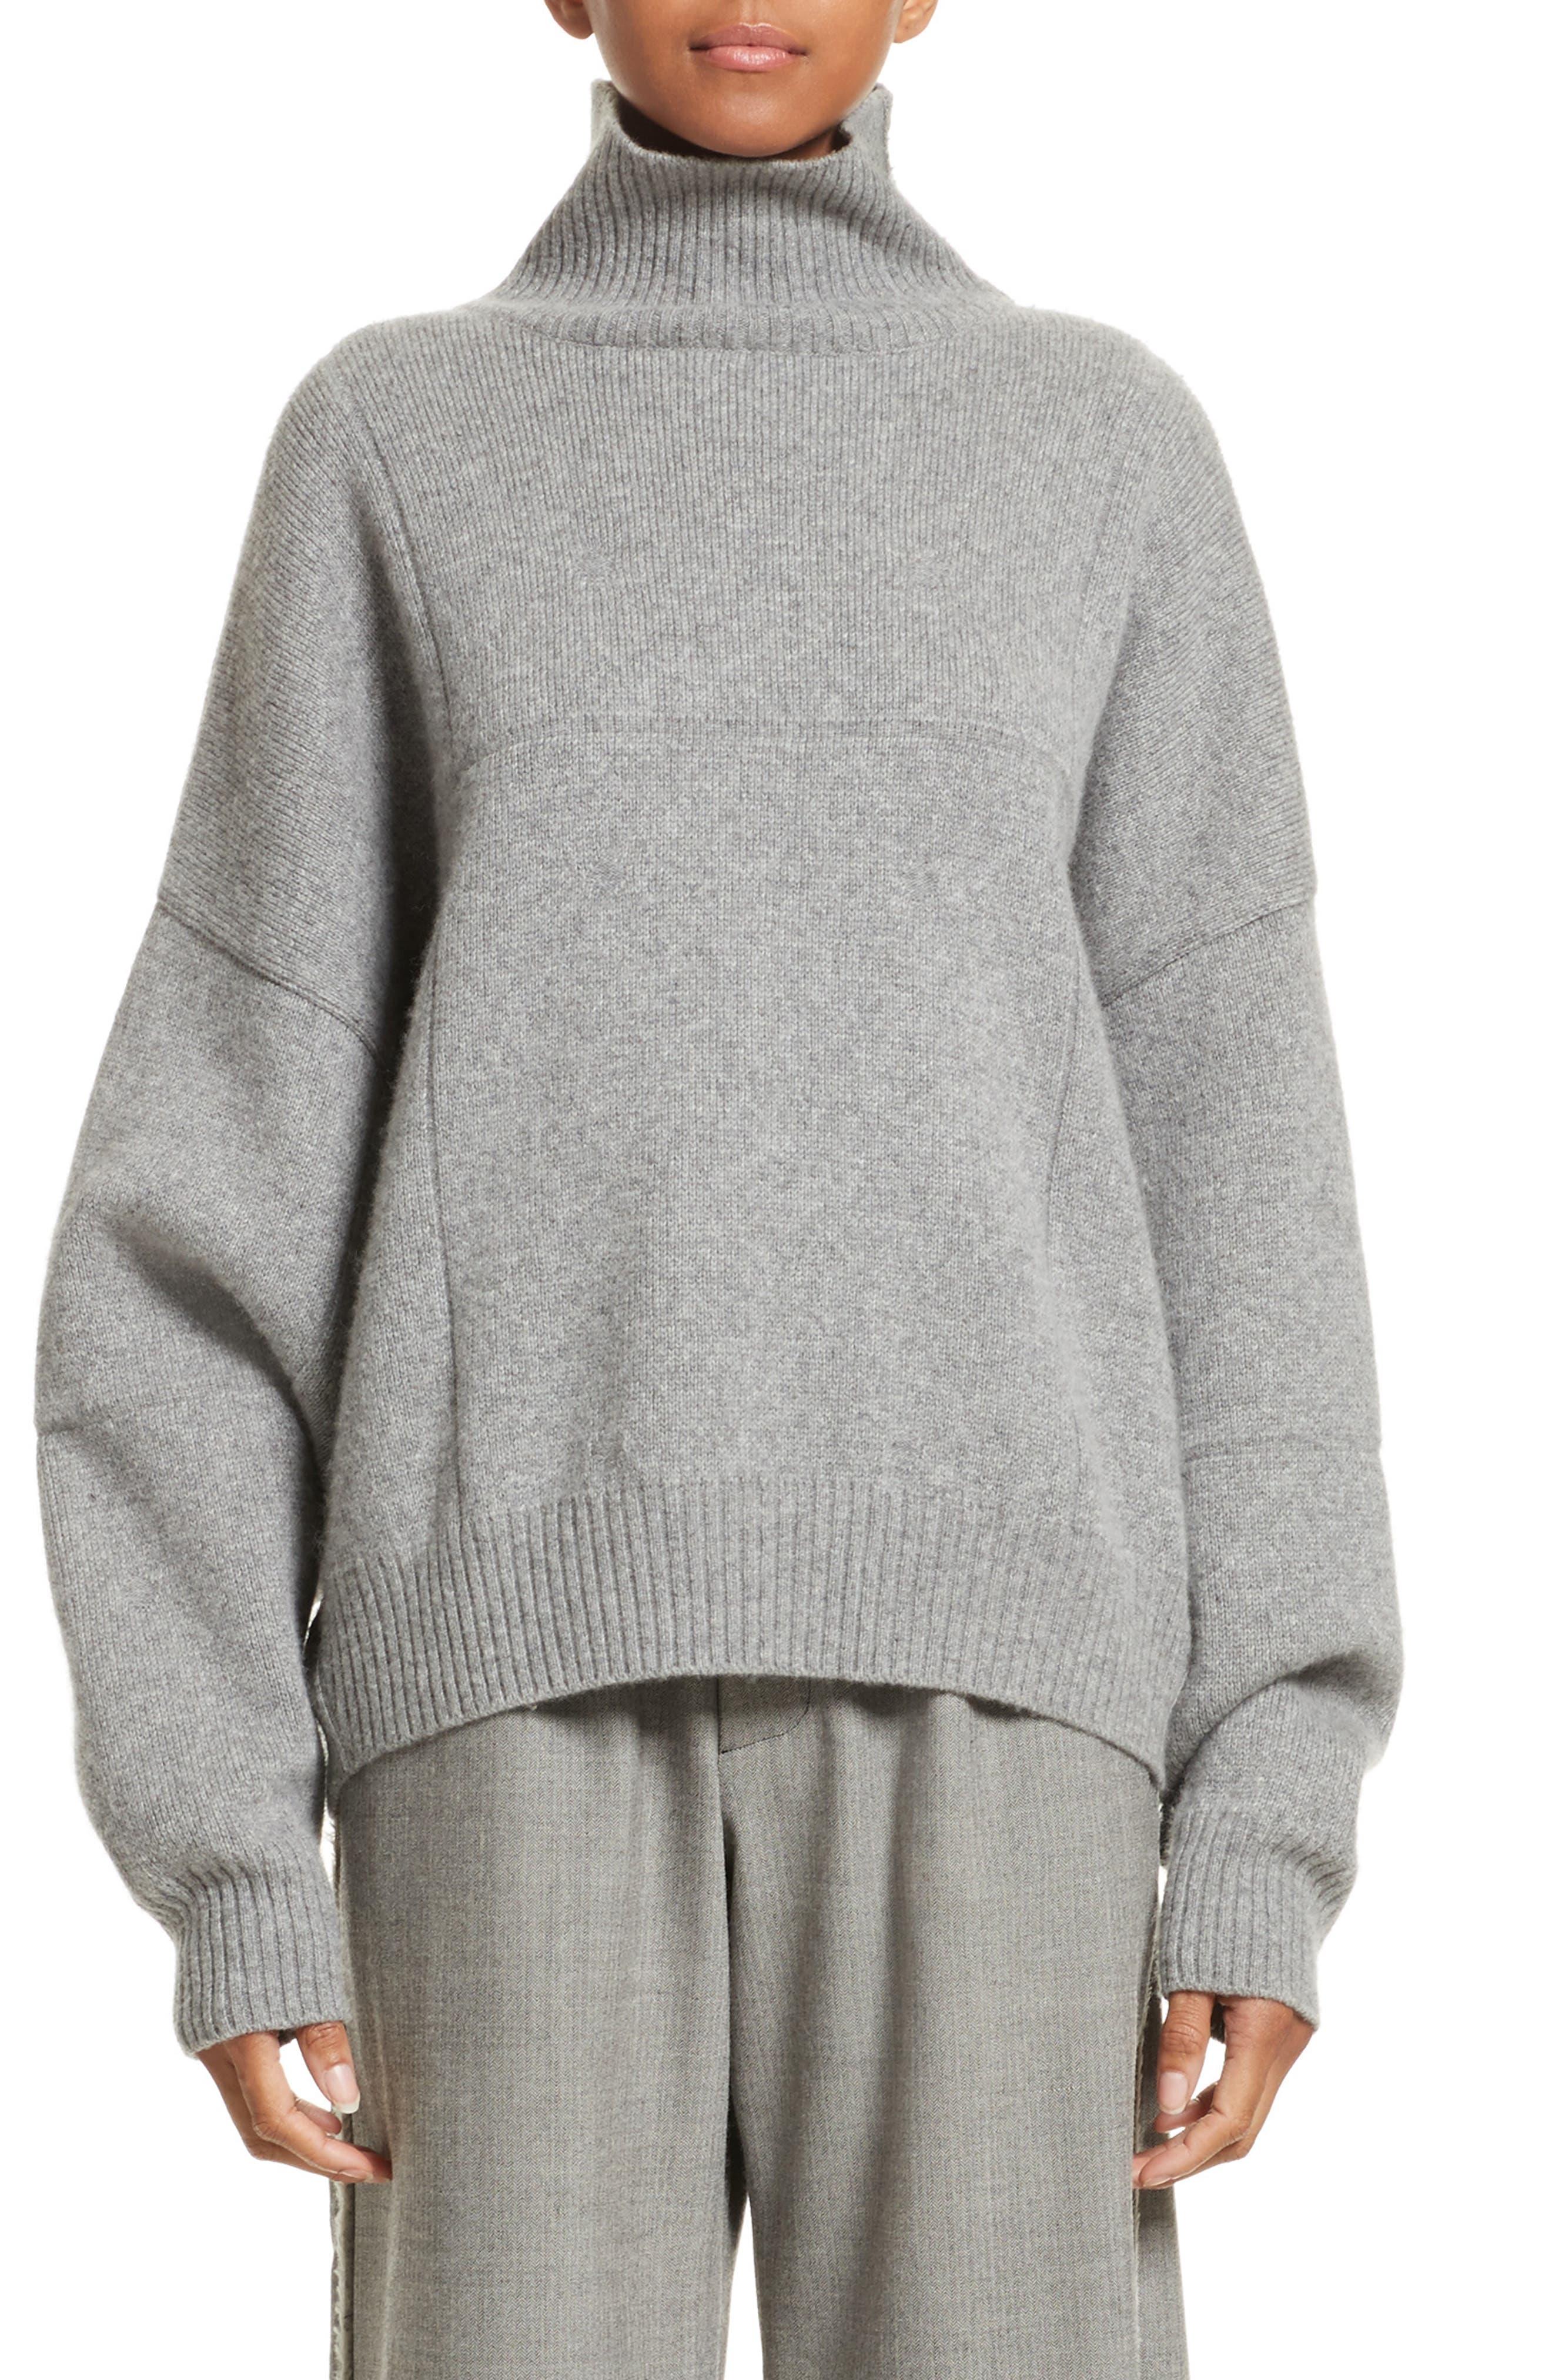 Main Image - Vejas Concrete Wool Turtleneck Sweater